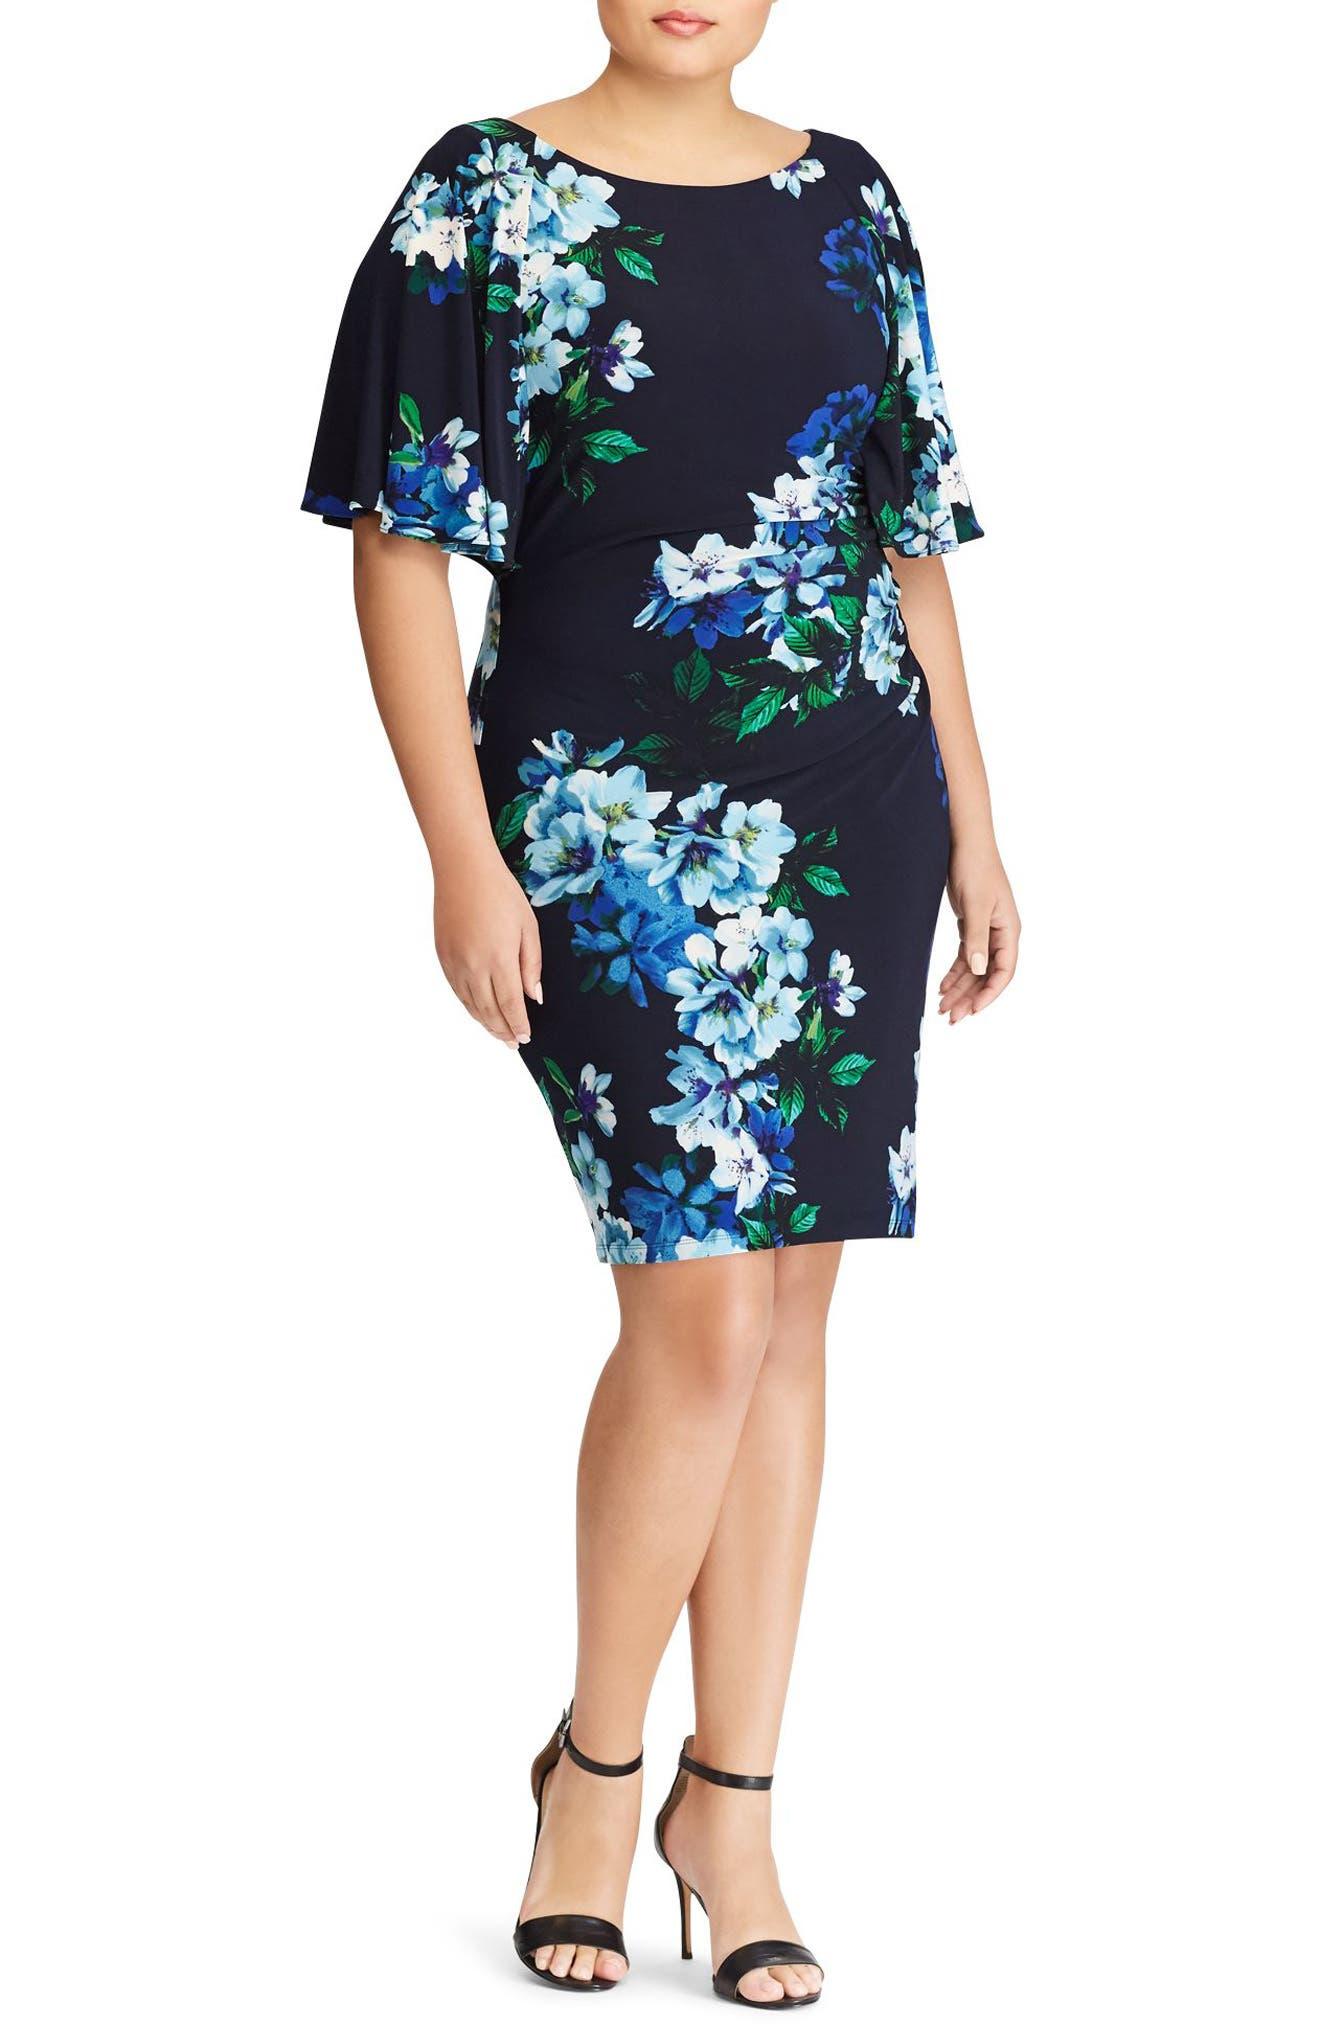 Lauren Ralph Lauren Jessup Tuxedo Floral Body-Con Dress (Plus Size)